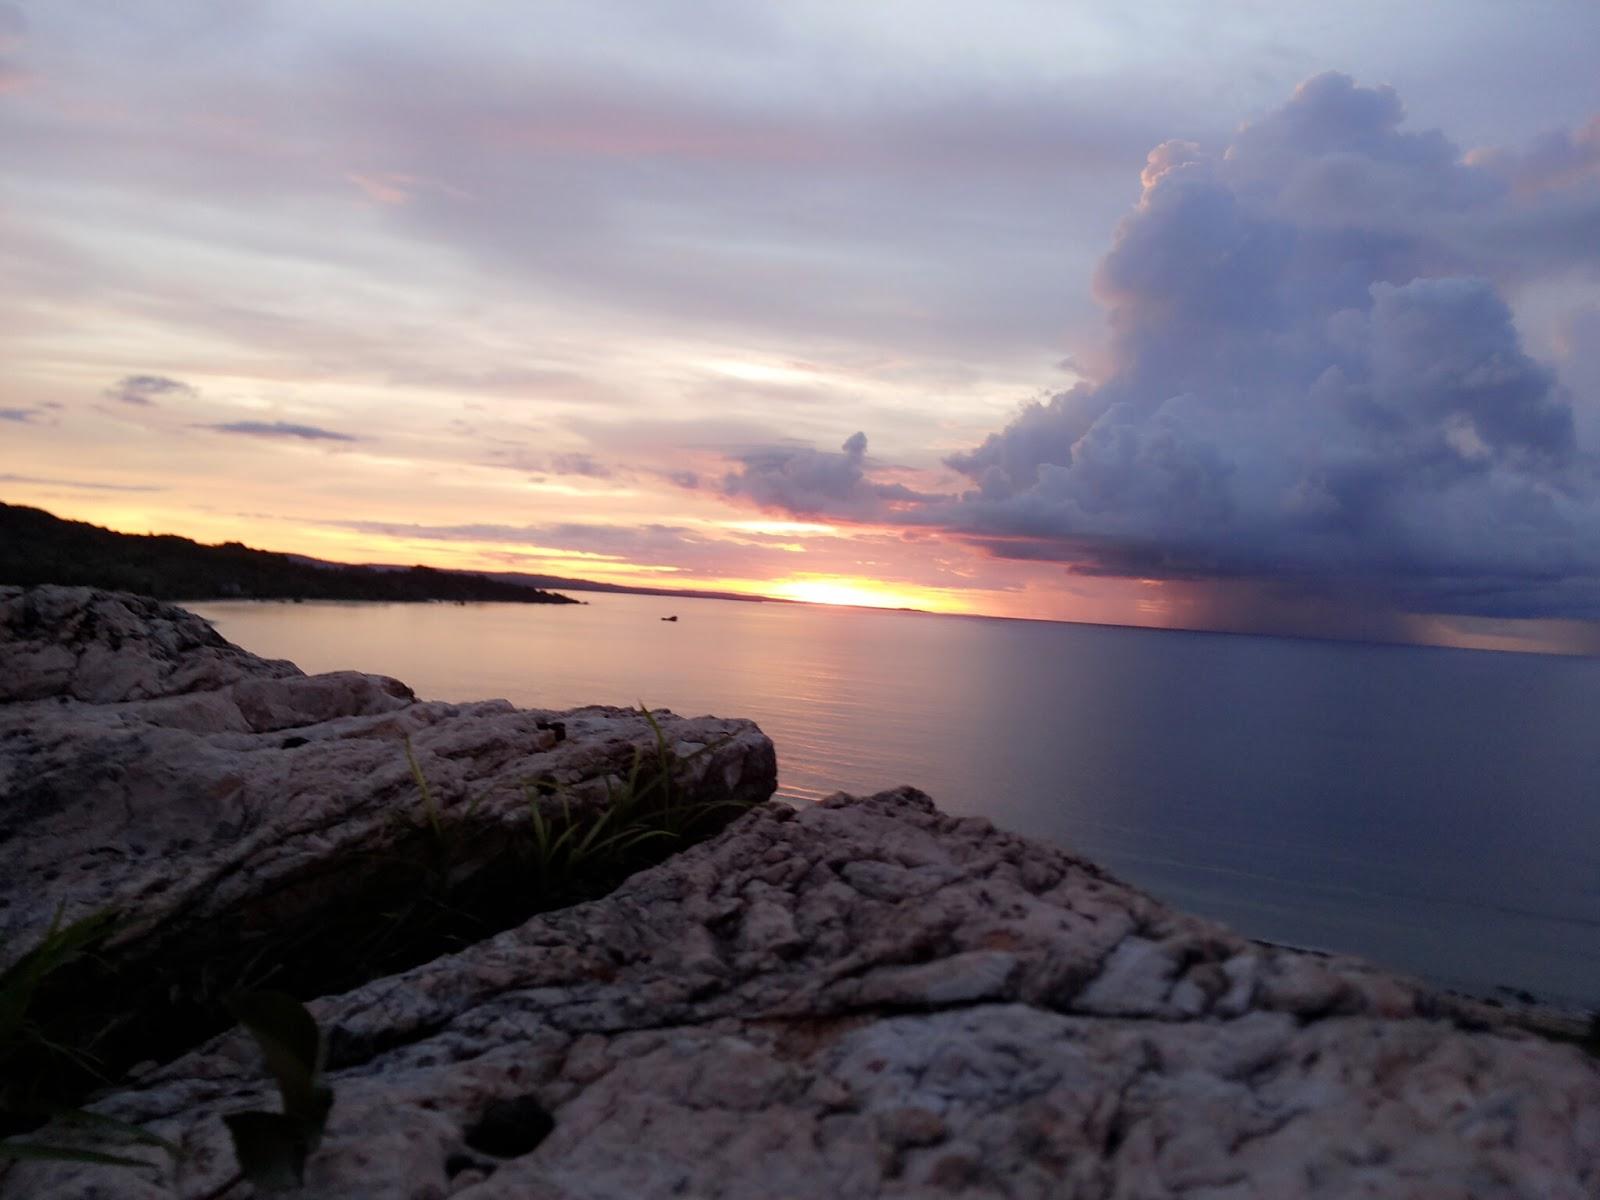 Arianto Ntt Sunset Pantai Batu Termanu Kabupaten Rote Ndao Menikmati